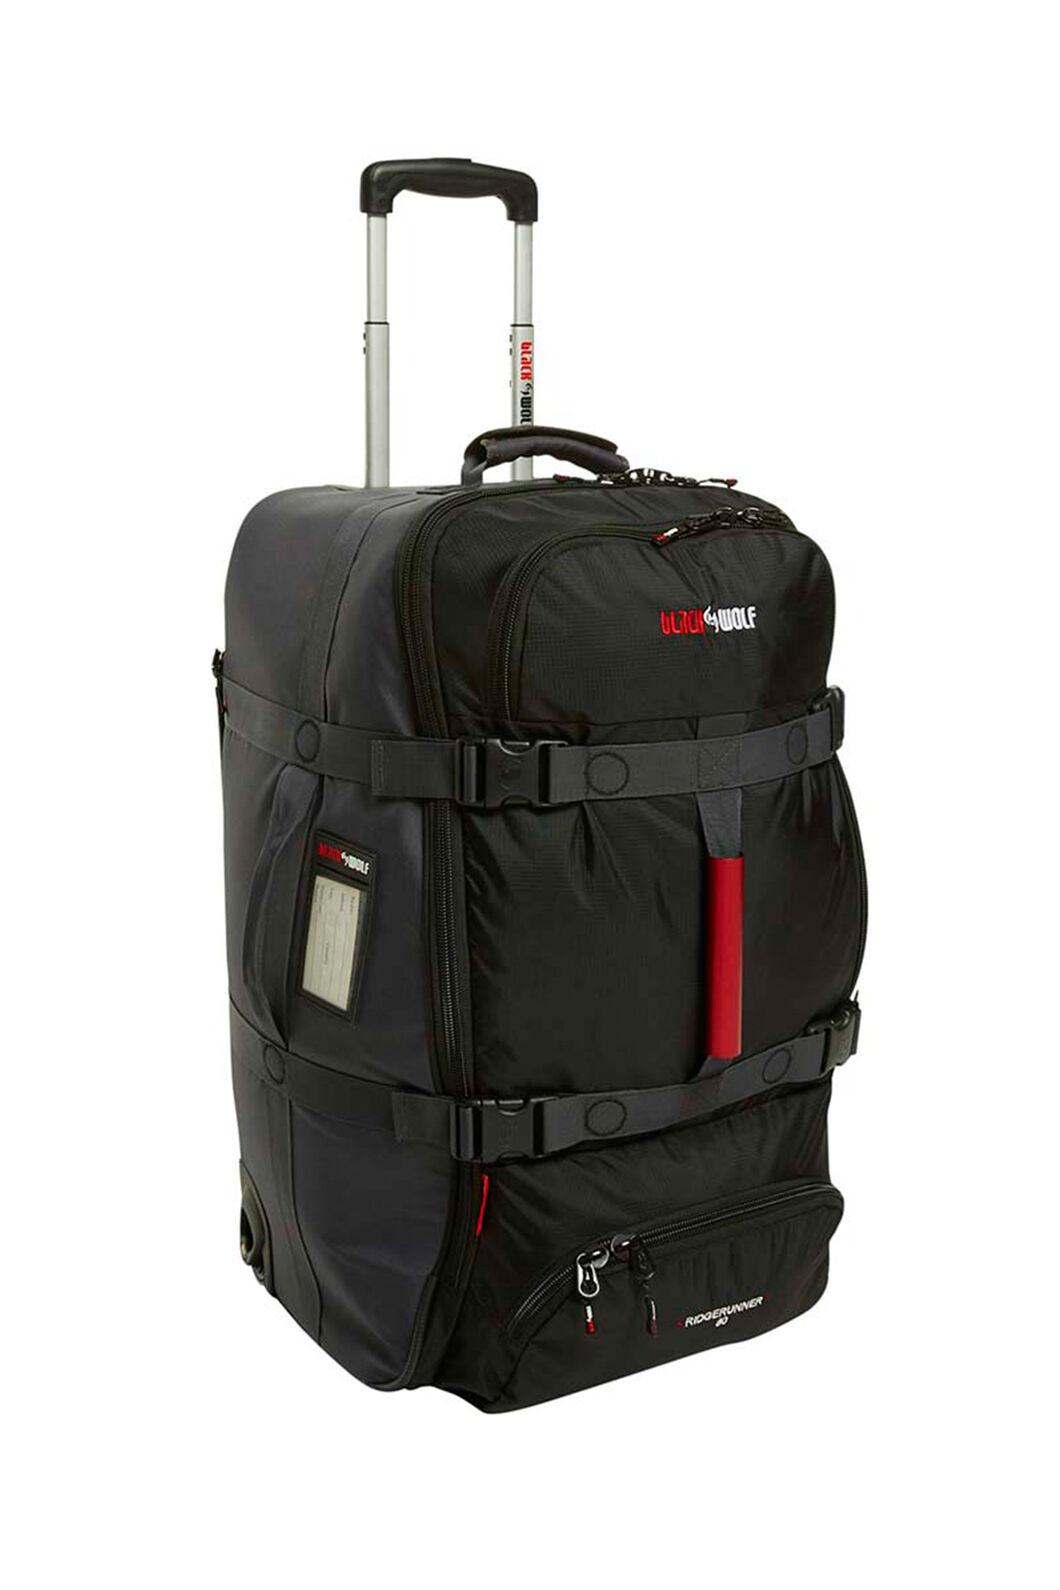 BlackWolf Ridge Runner 80L Wheeled Luggage, None, hi-res